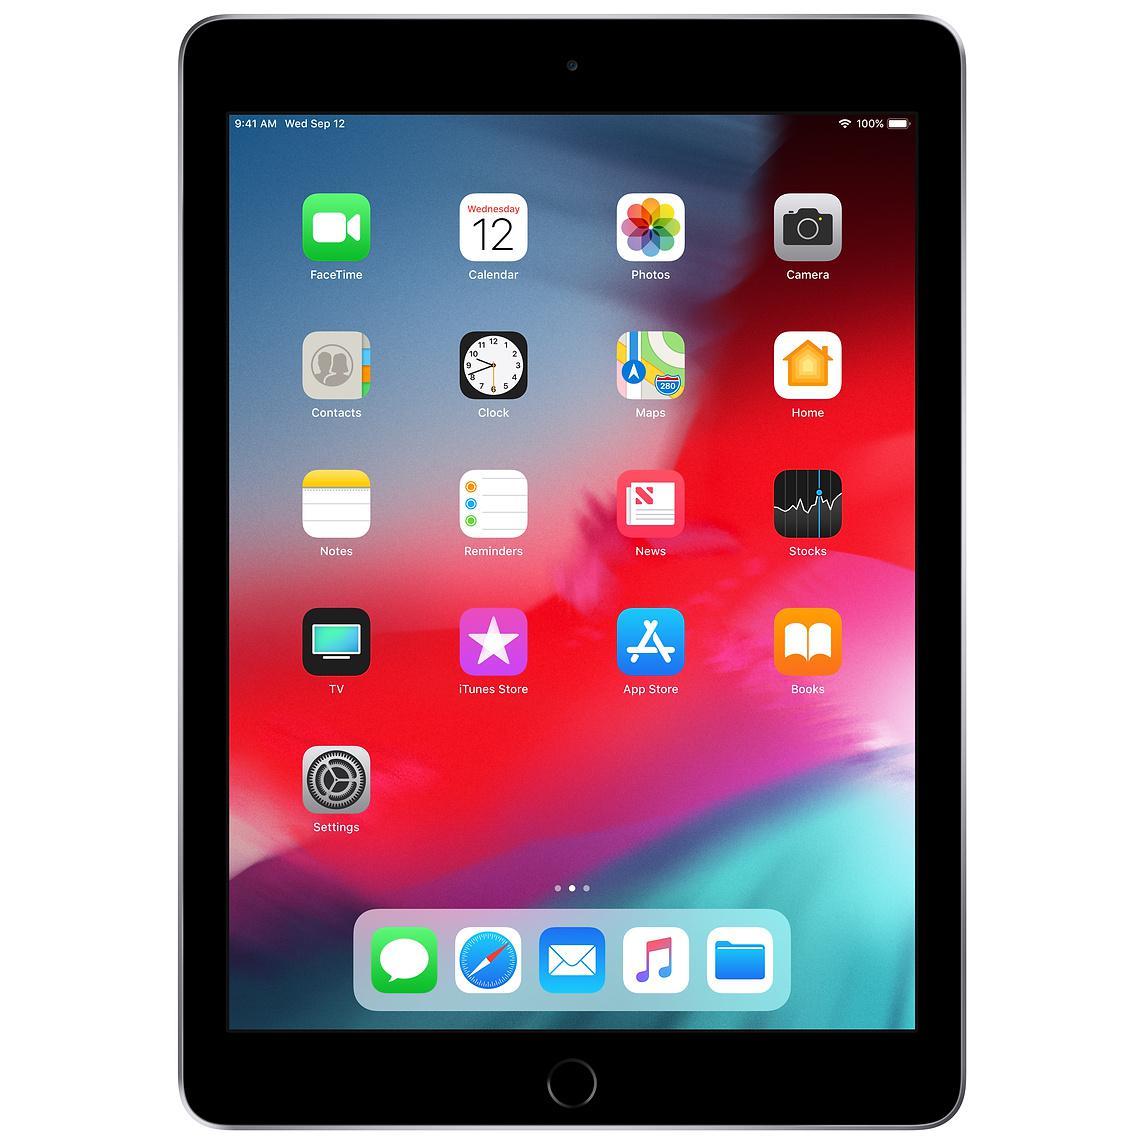 iPad 9.7-inch 6th Gen (2018) - Wi-Fi + GSM/CDMA + LTE